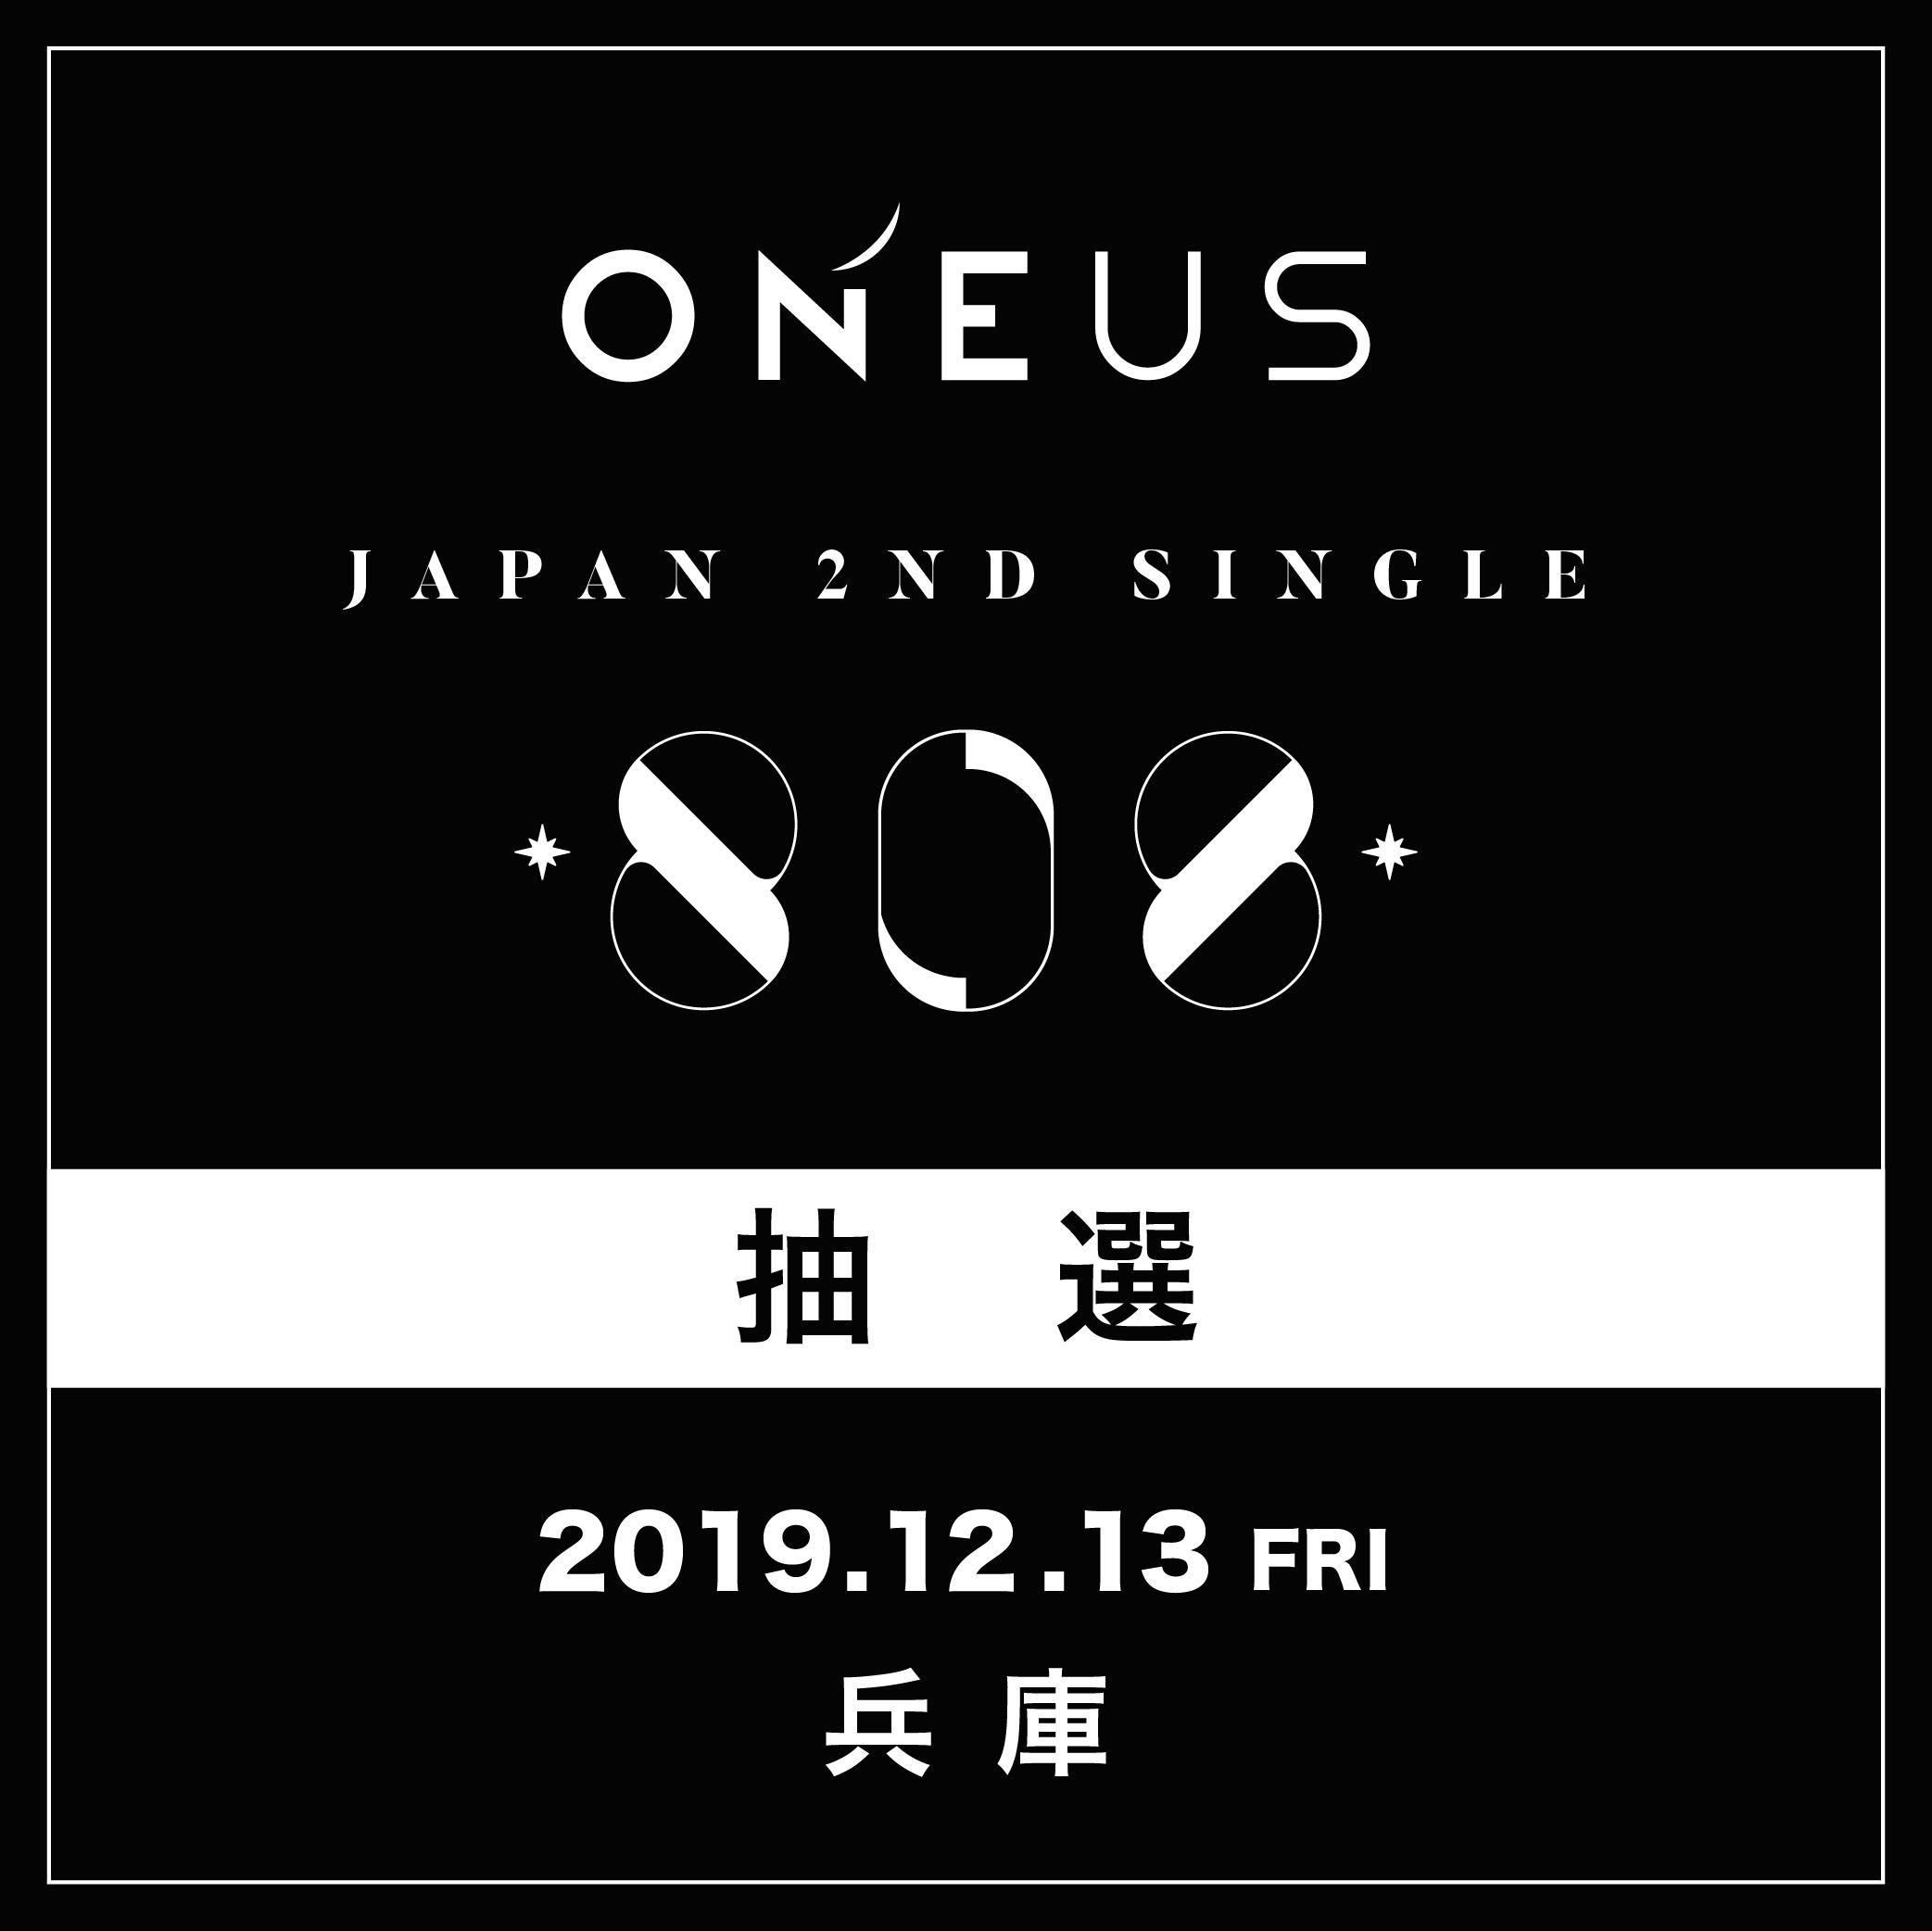 【ONEUS】12/13(金)神戸ハーバーランドスペースシアター 抽選応募口